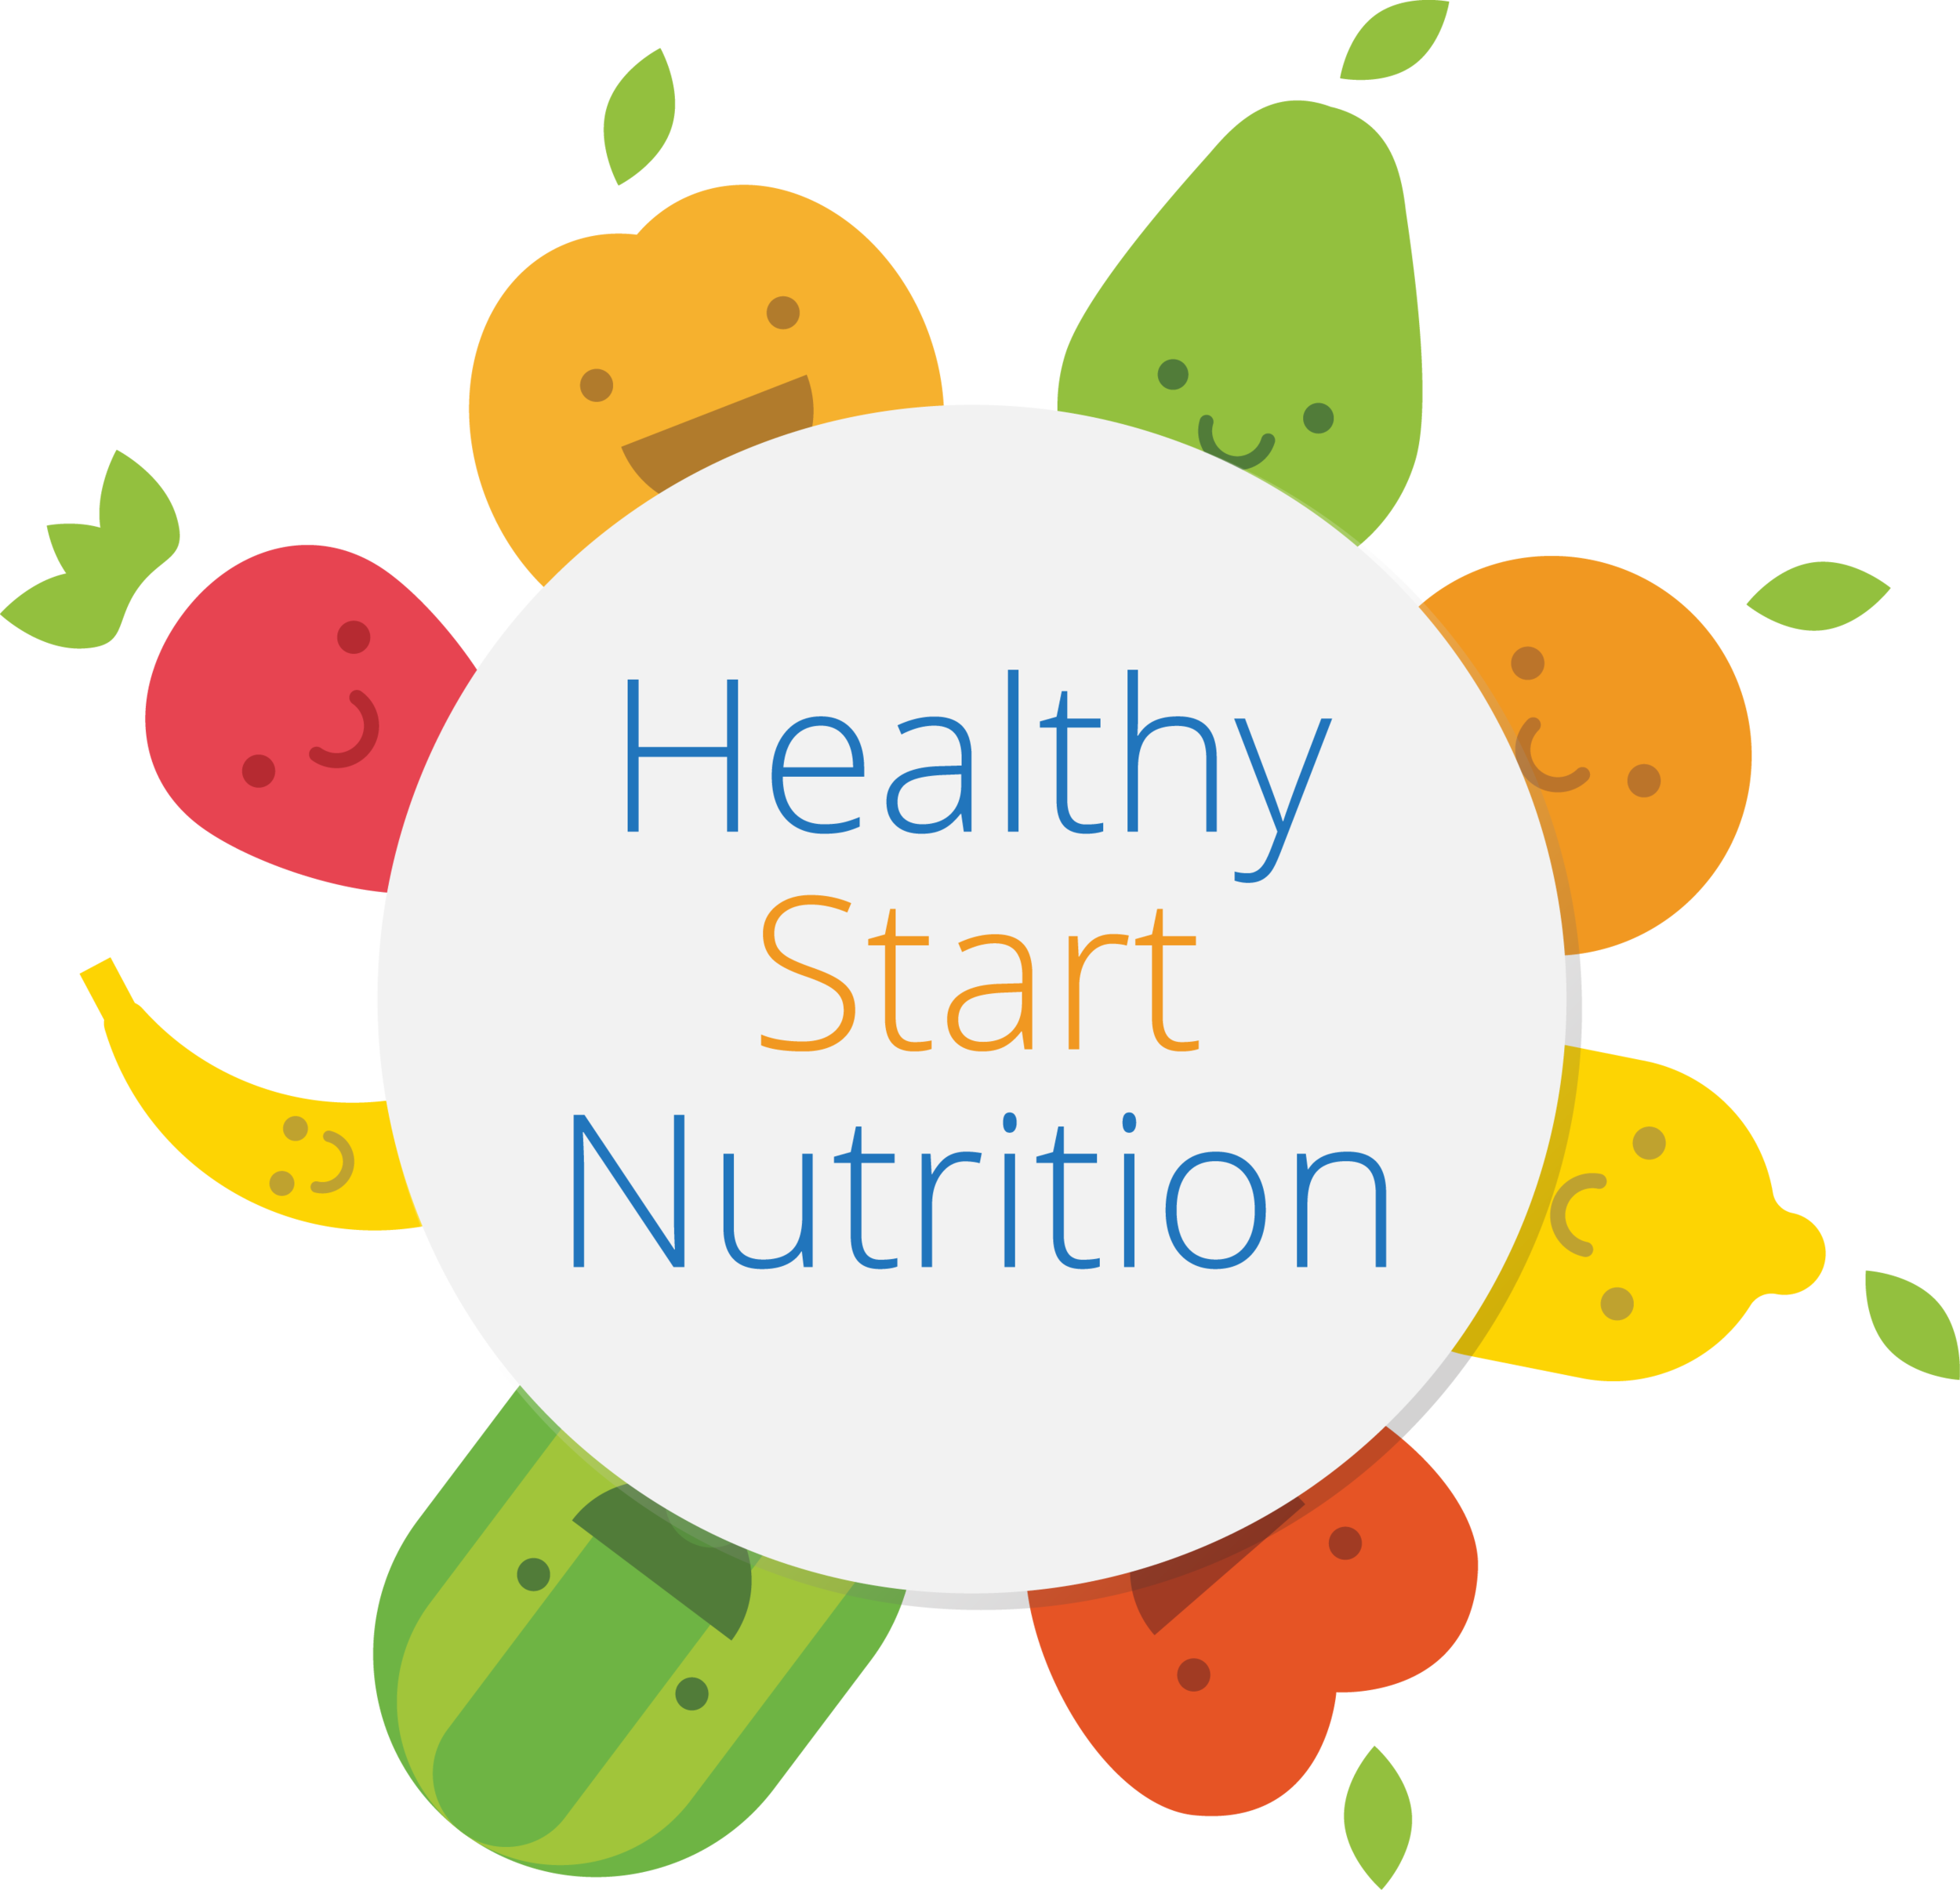 Healthy Start Nutrition